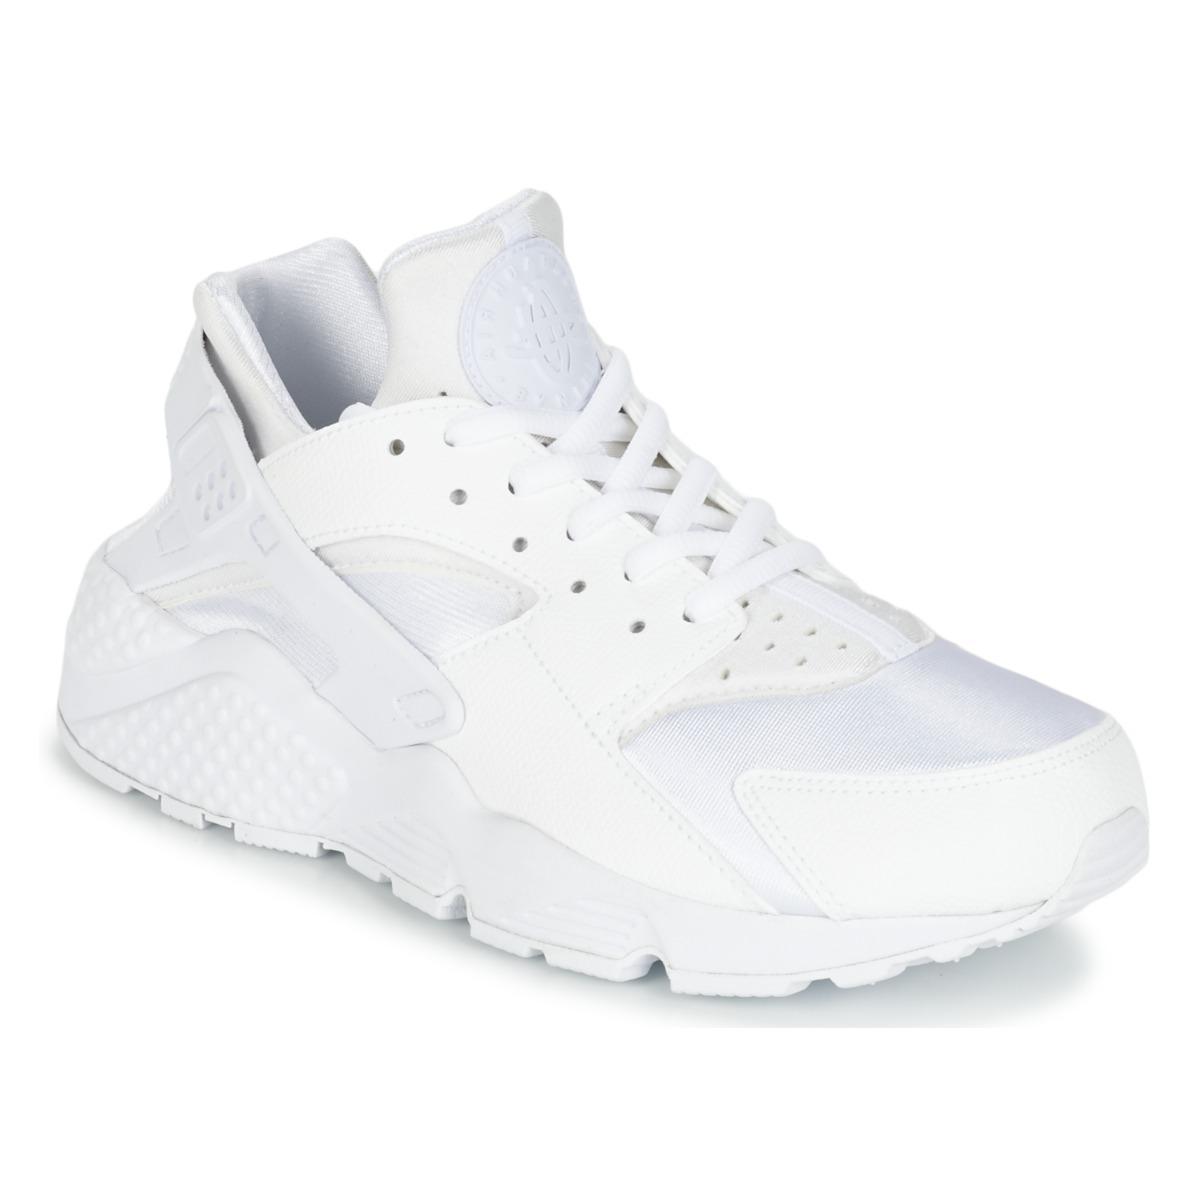 45c7ce42eb28 Nike Air Huarache Run W Shoes (trainers) in White - Lyst